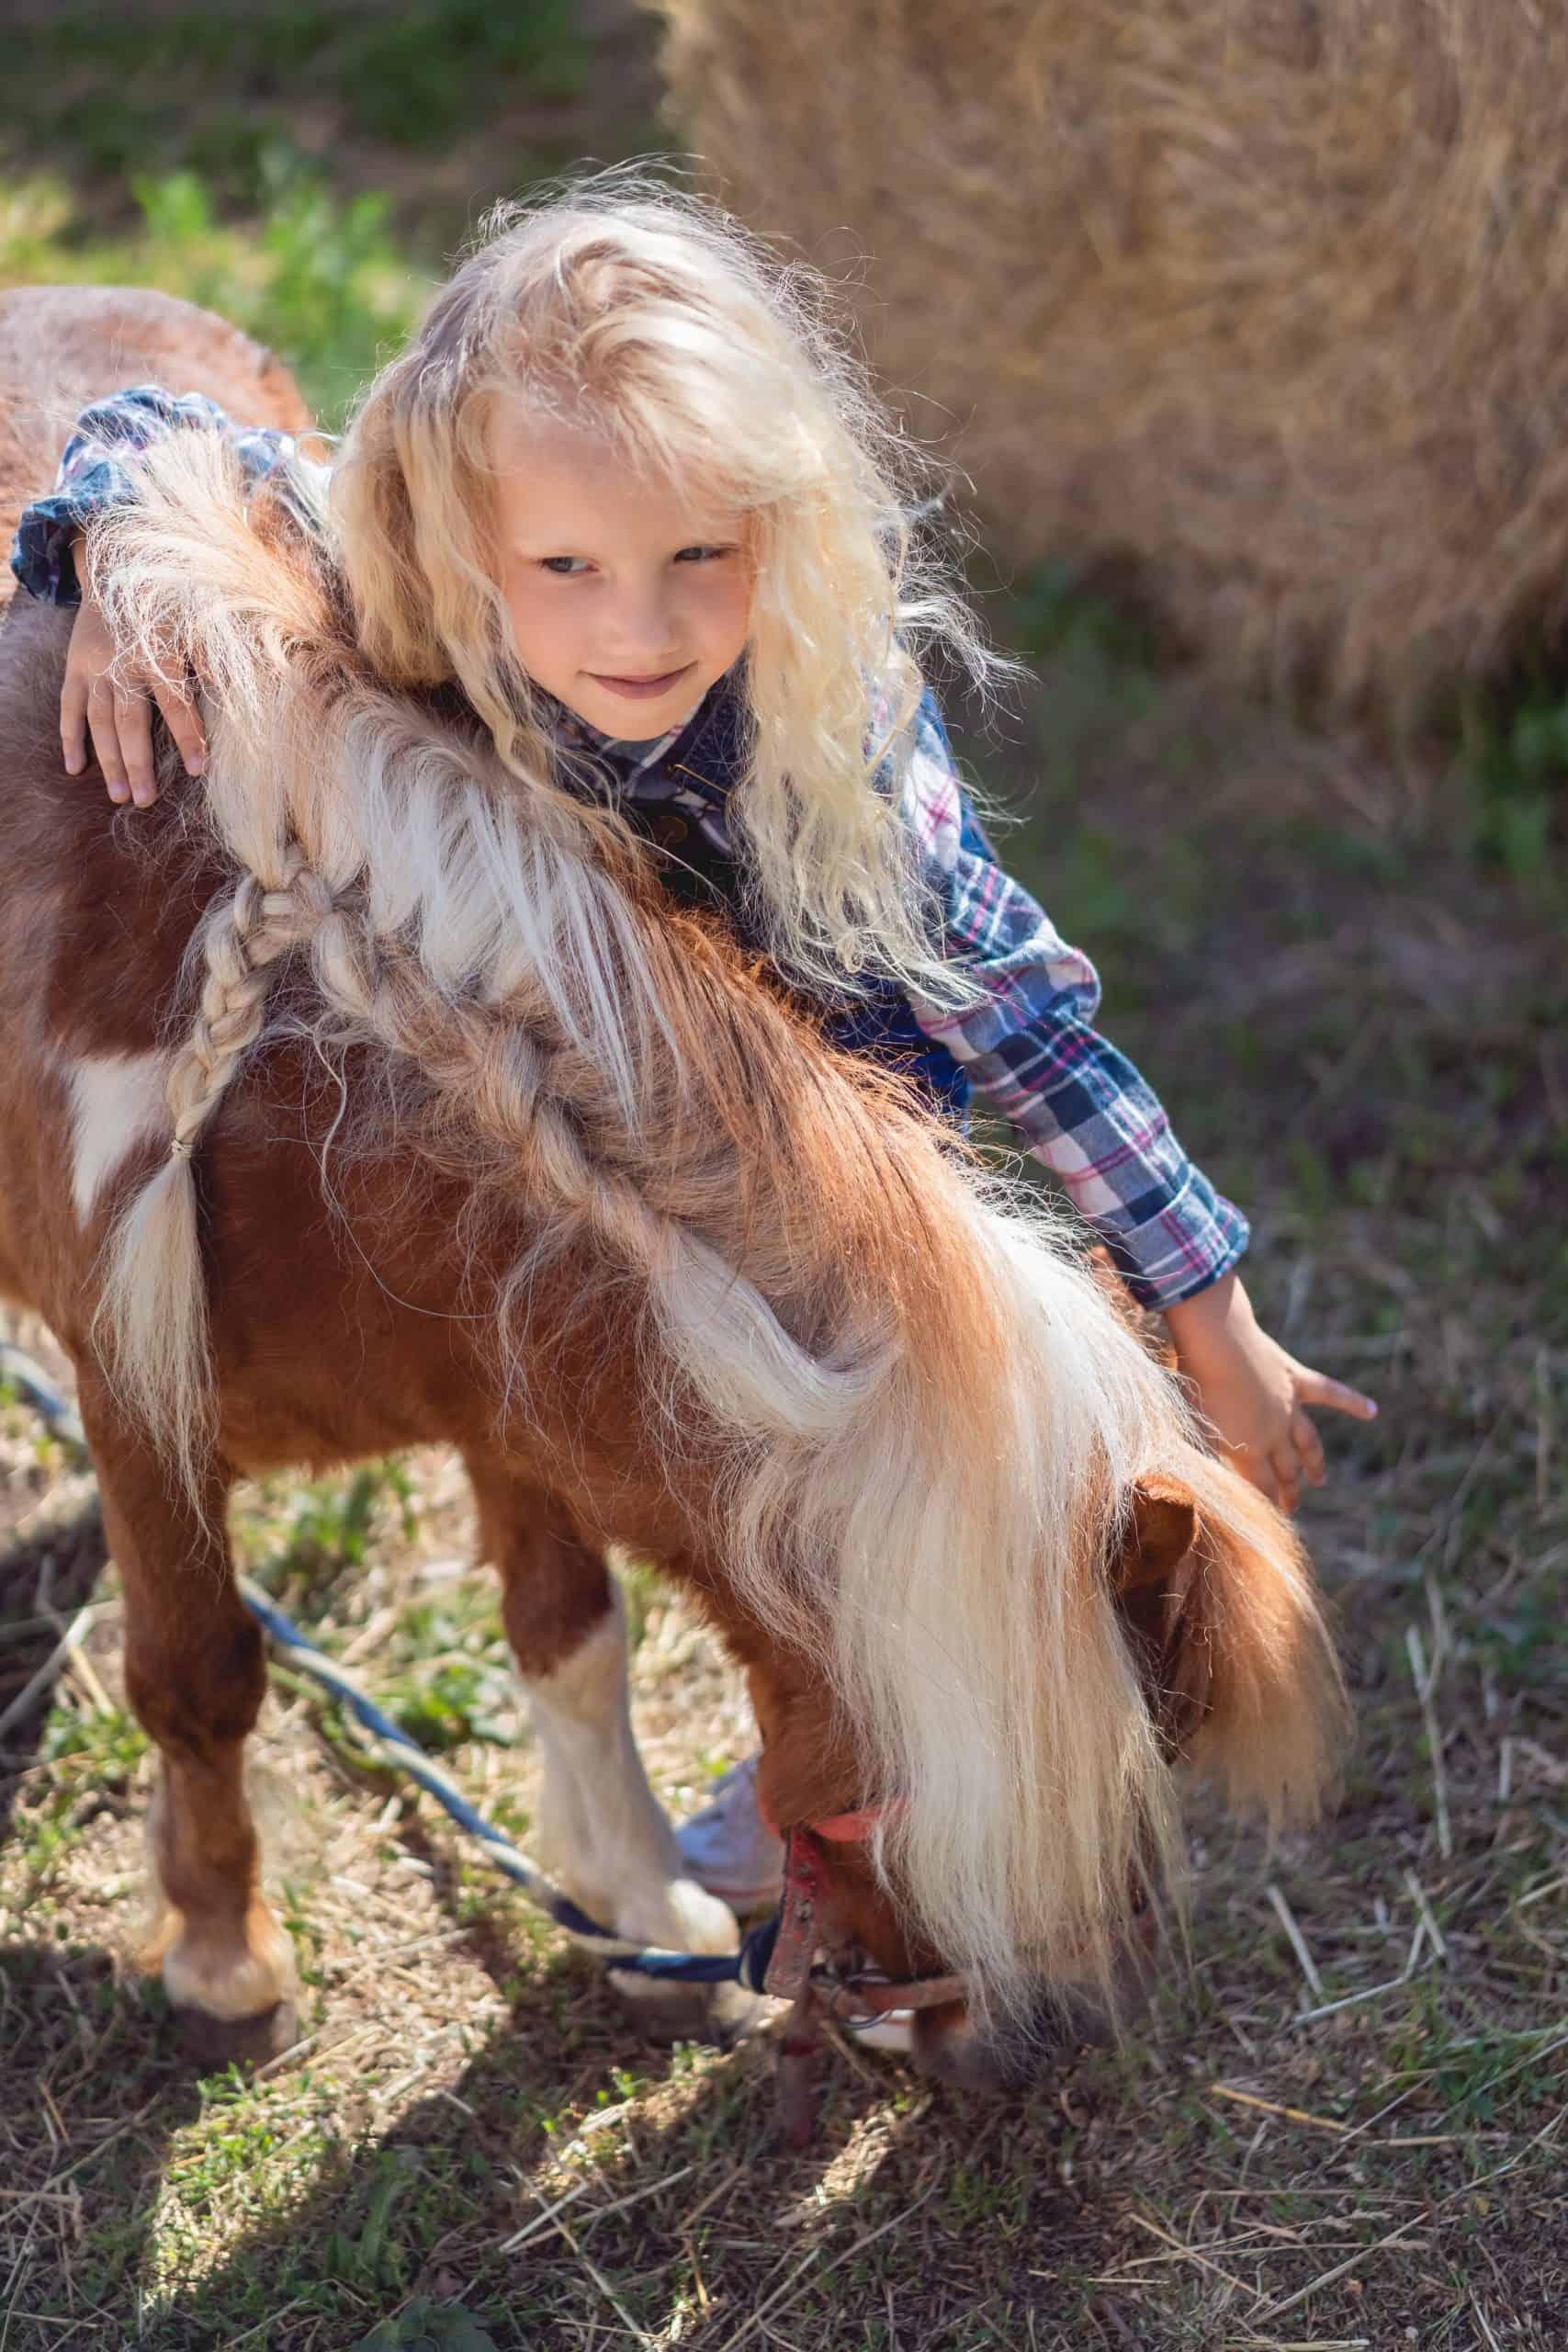 preteen child hugging cute equine at farm